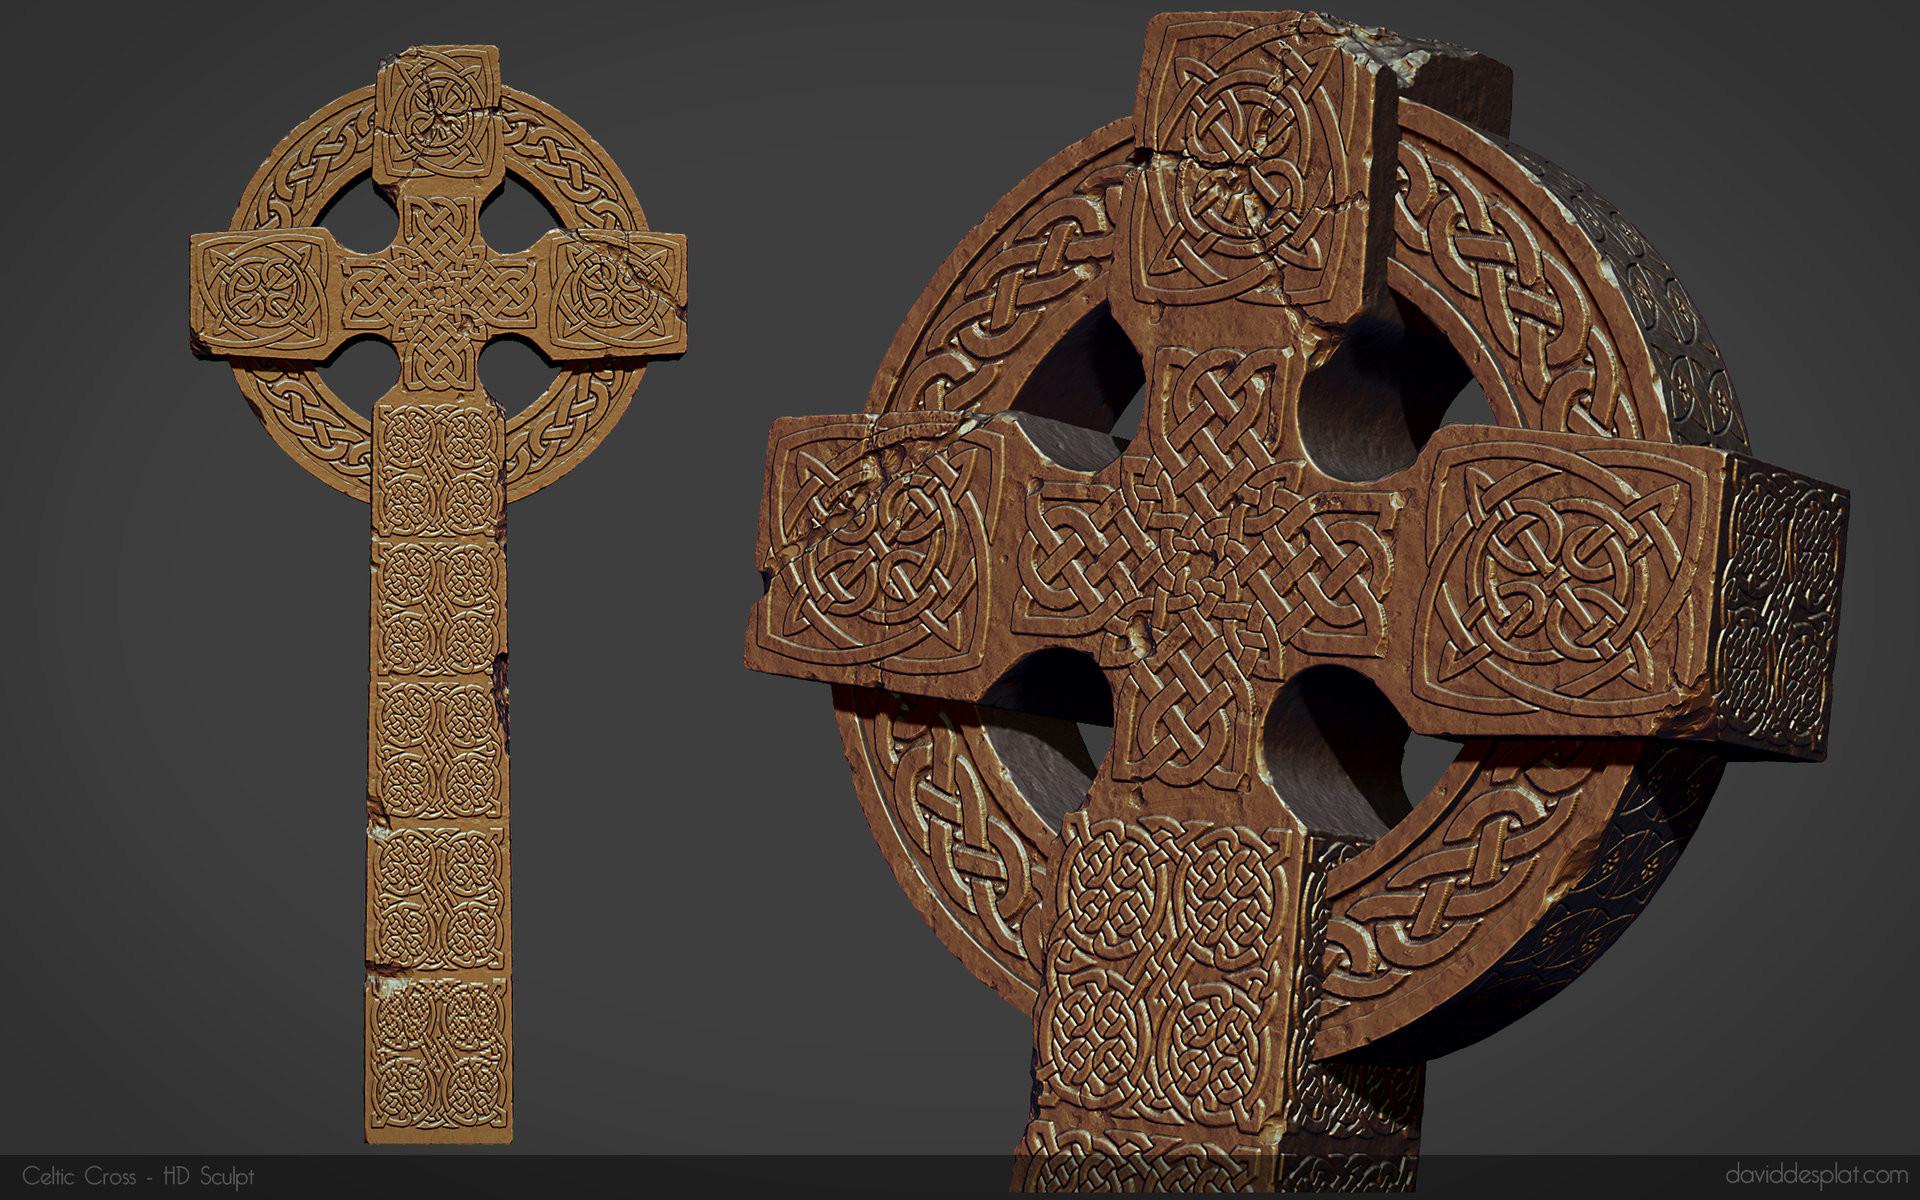 Res: 1920x1200, Study - Celtic Cross